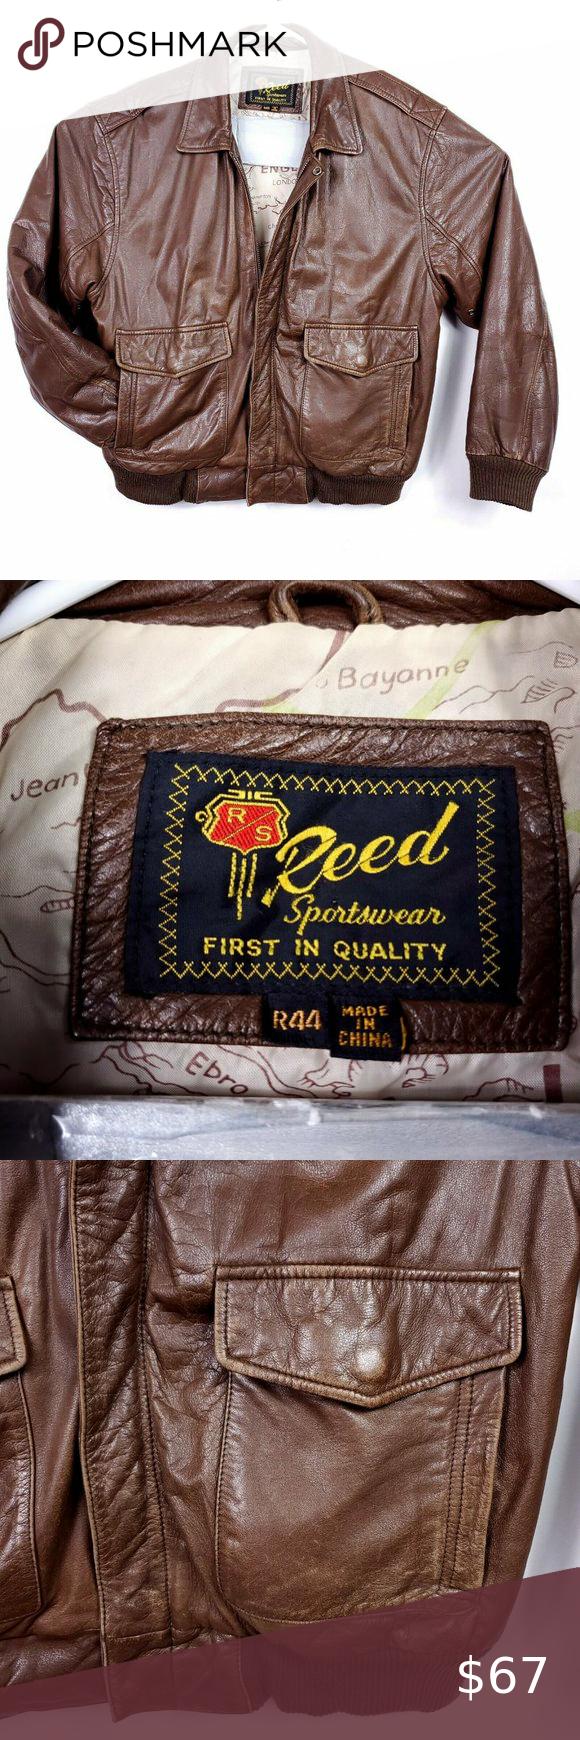 Vintage Reed Sportswear Leather Bomber Jacket in 2020